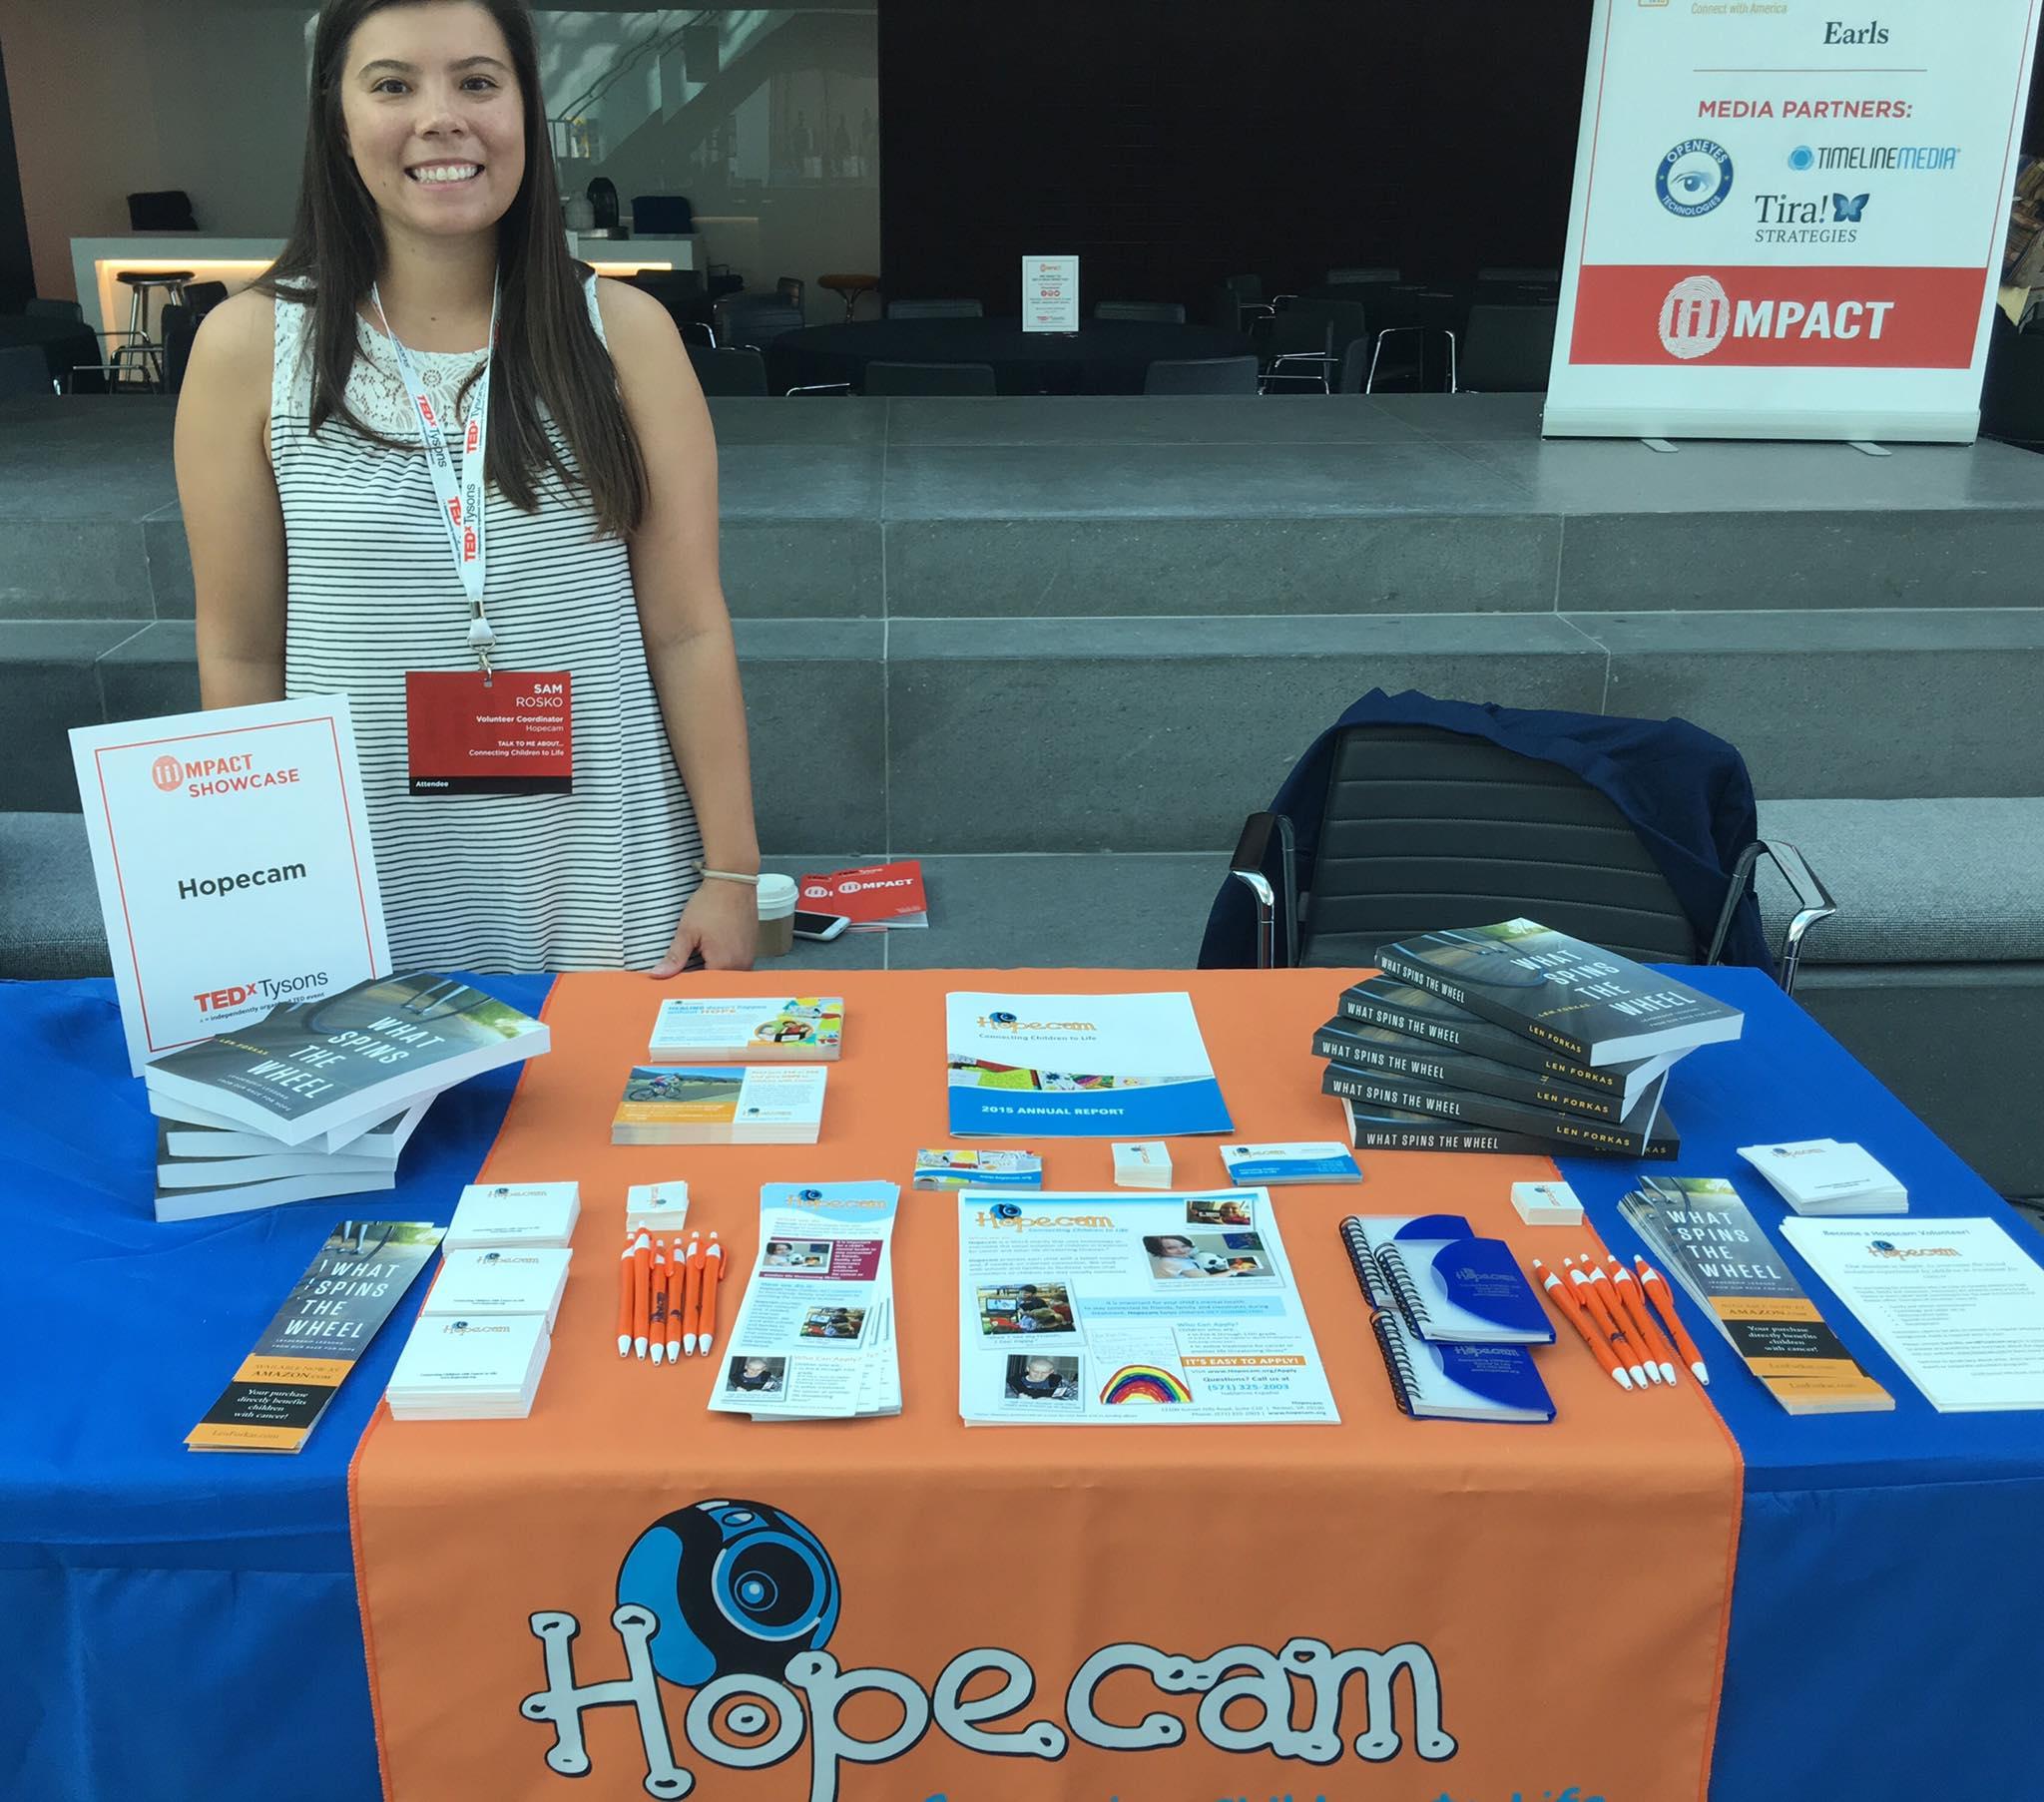 Sam Rosko - Hopecam Volunteer Coordinator